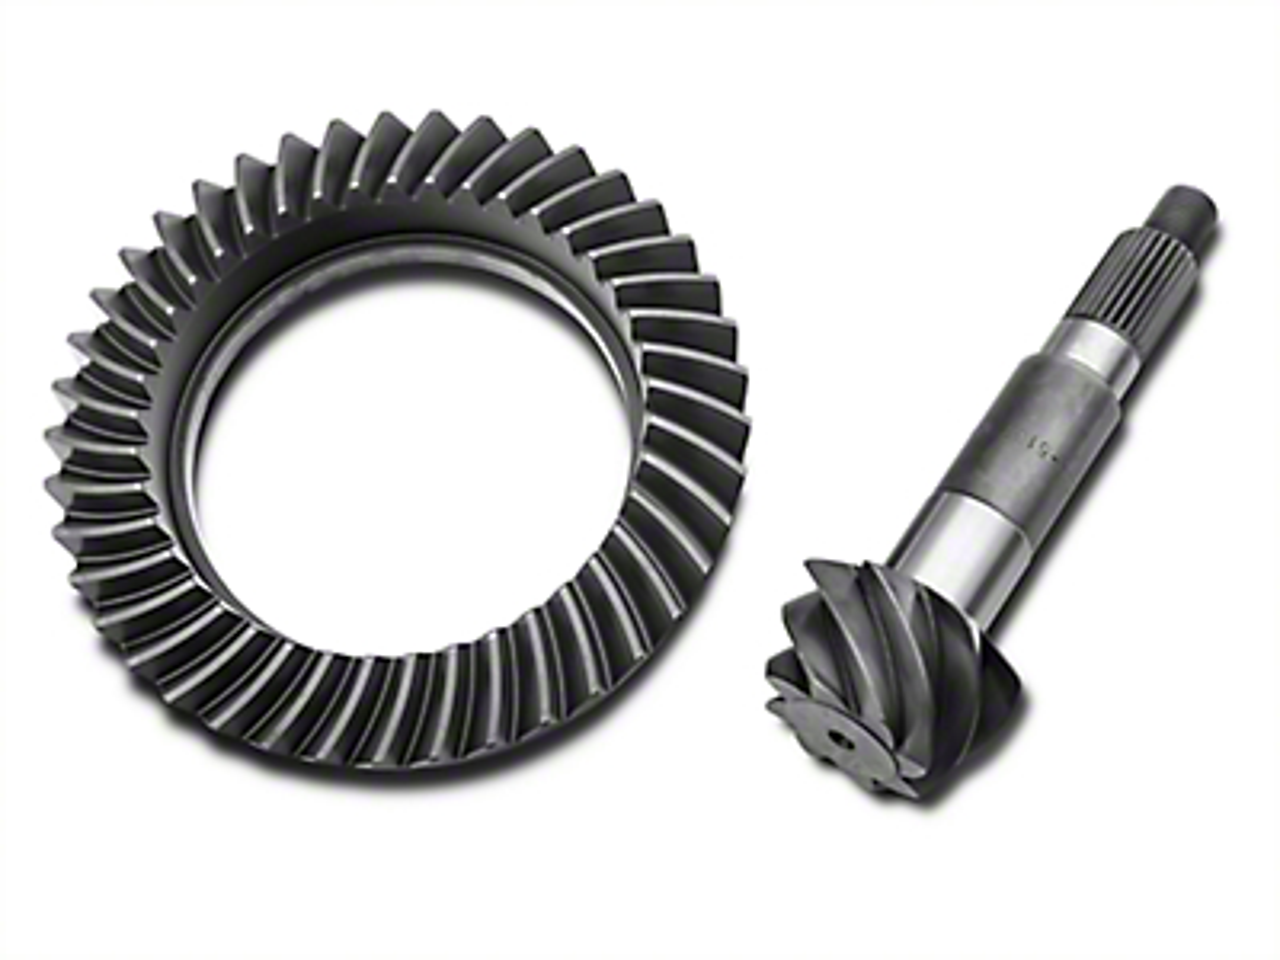 Yukon Gear Dana 44 Rear Ring Gear and Pinion Kit - 5.13 Gears (03-06 Jeep Wrangler TJ Rubicon)